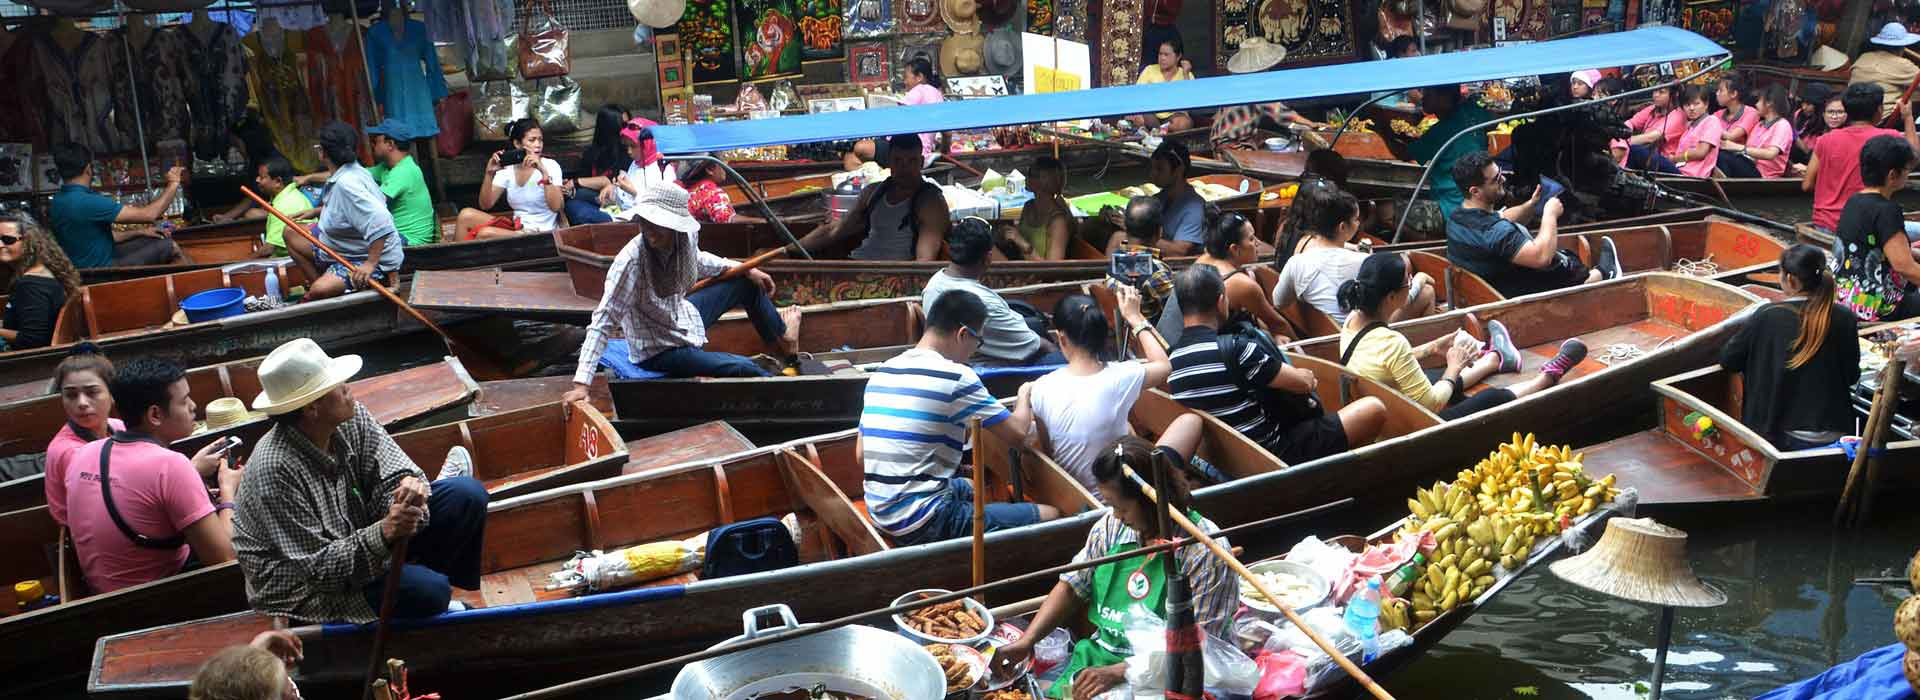 4D3N Bangkok Halfboard